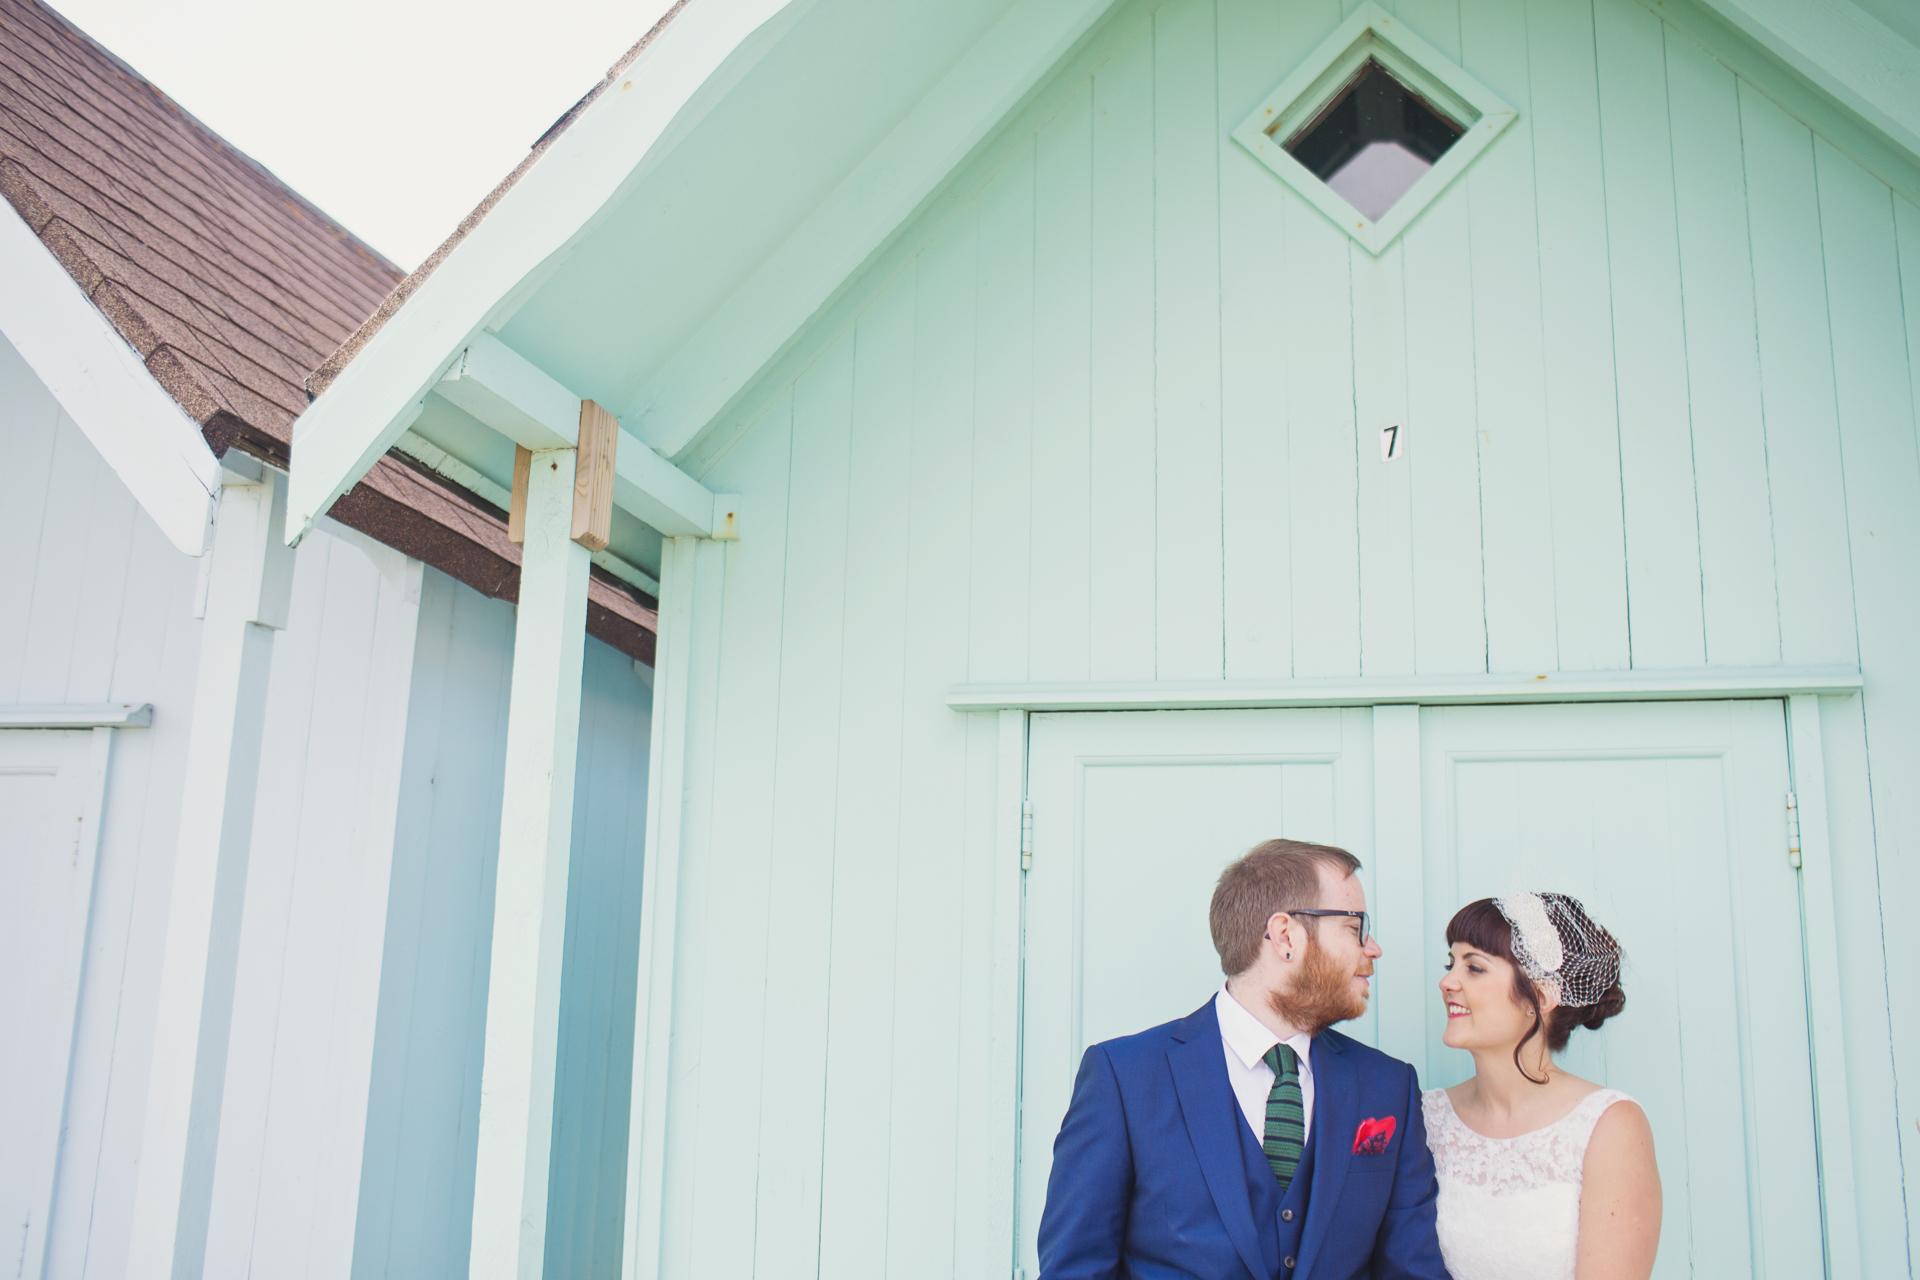 southsea beach huts wedding photo